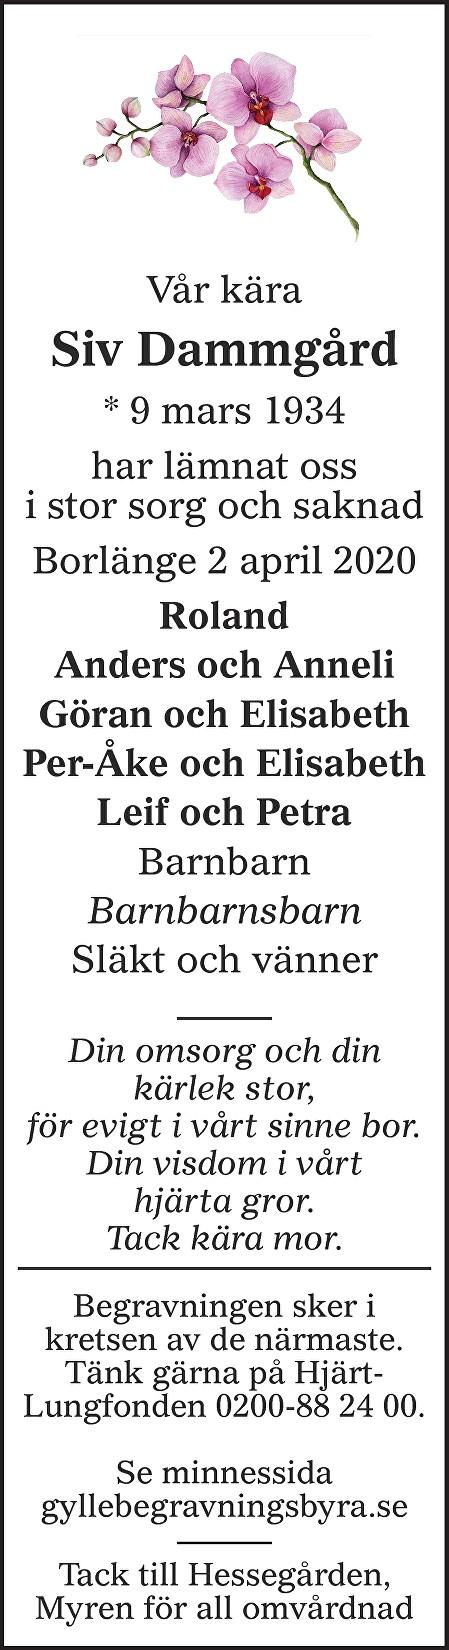 Siv Dammgård Death notice